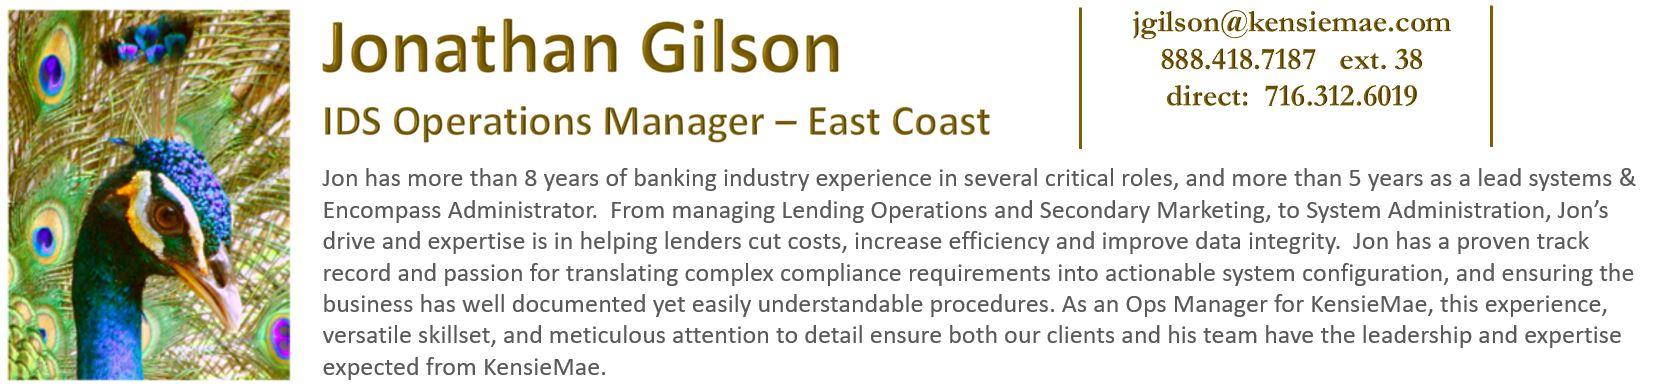 Jon Gilson Bio.JPG